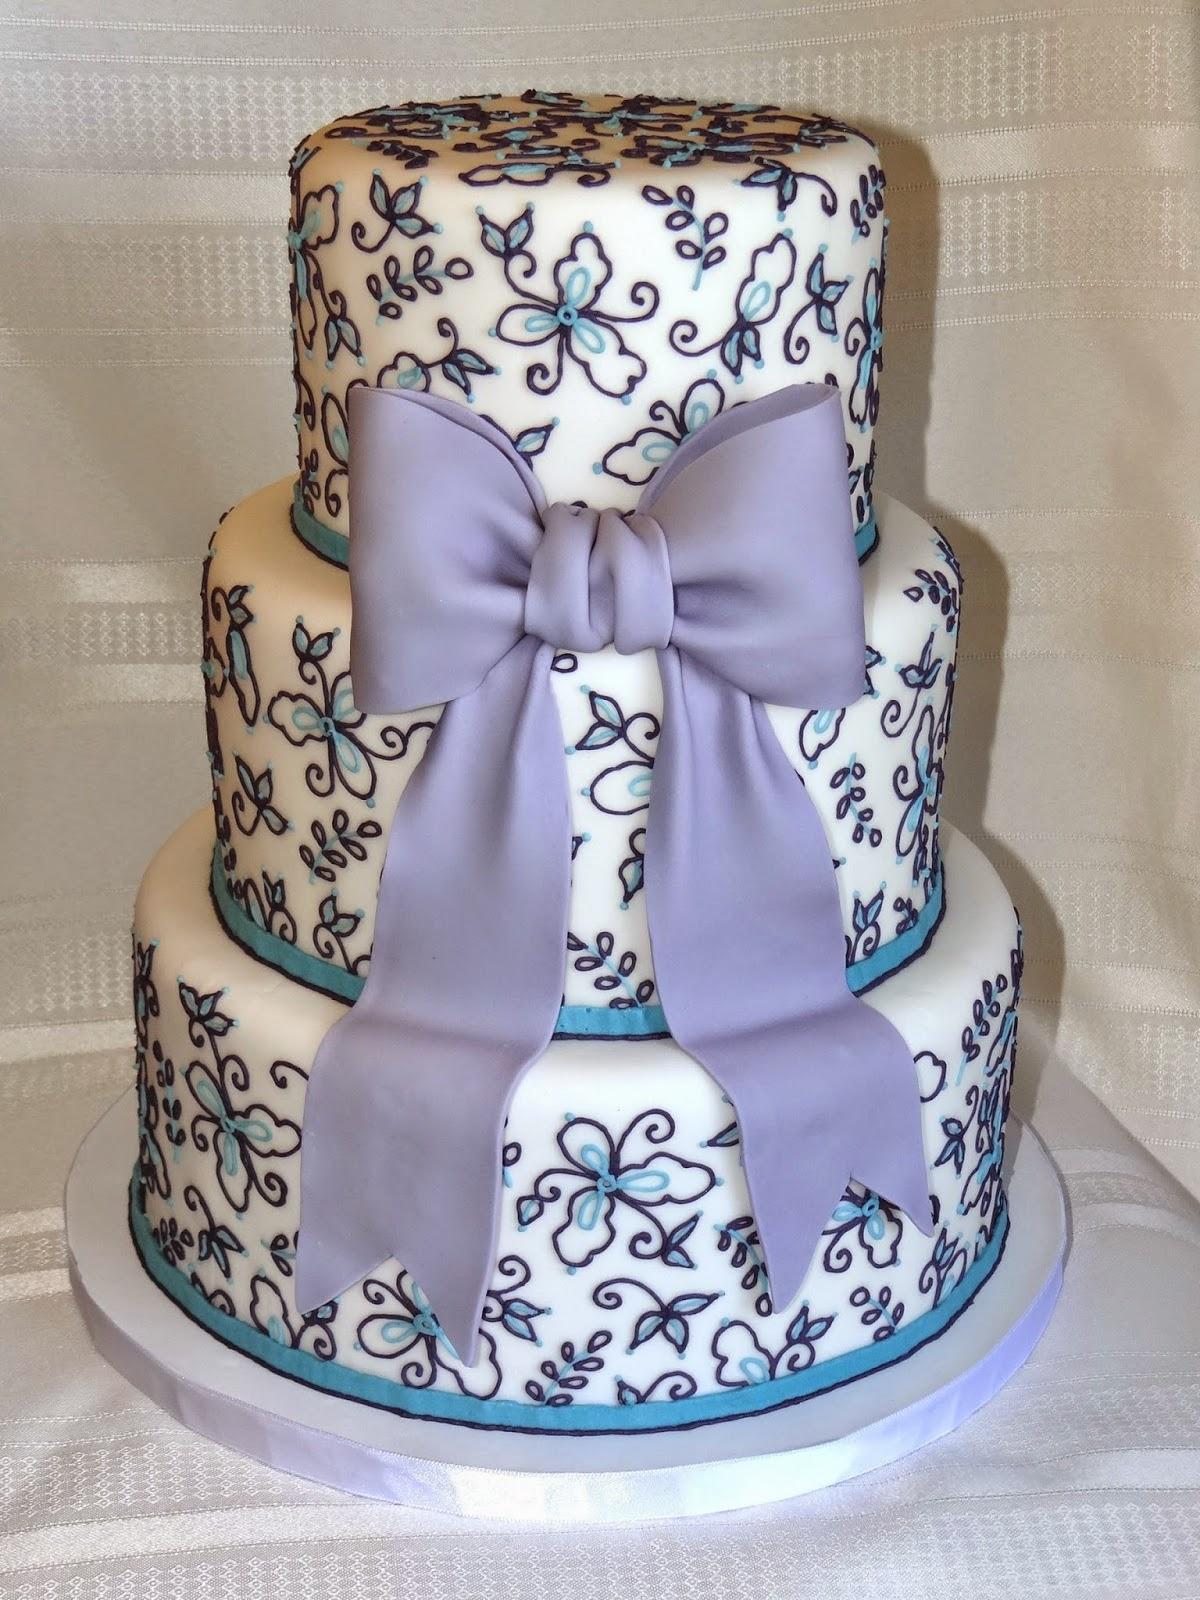 Tiers of Joy Cakery Dark Purple and Turquoise Wedding Cake